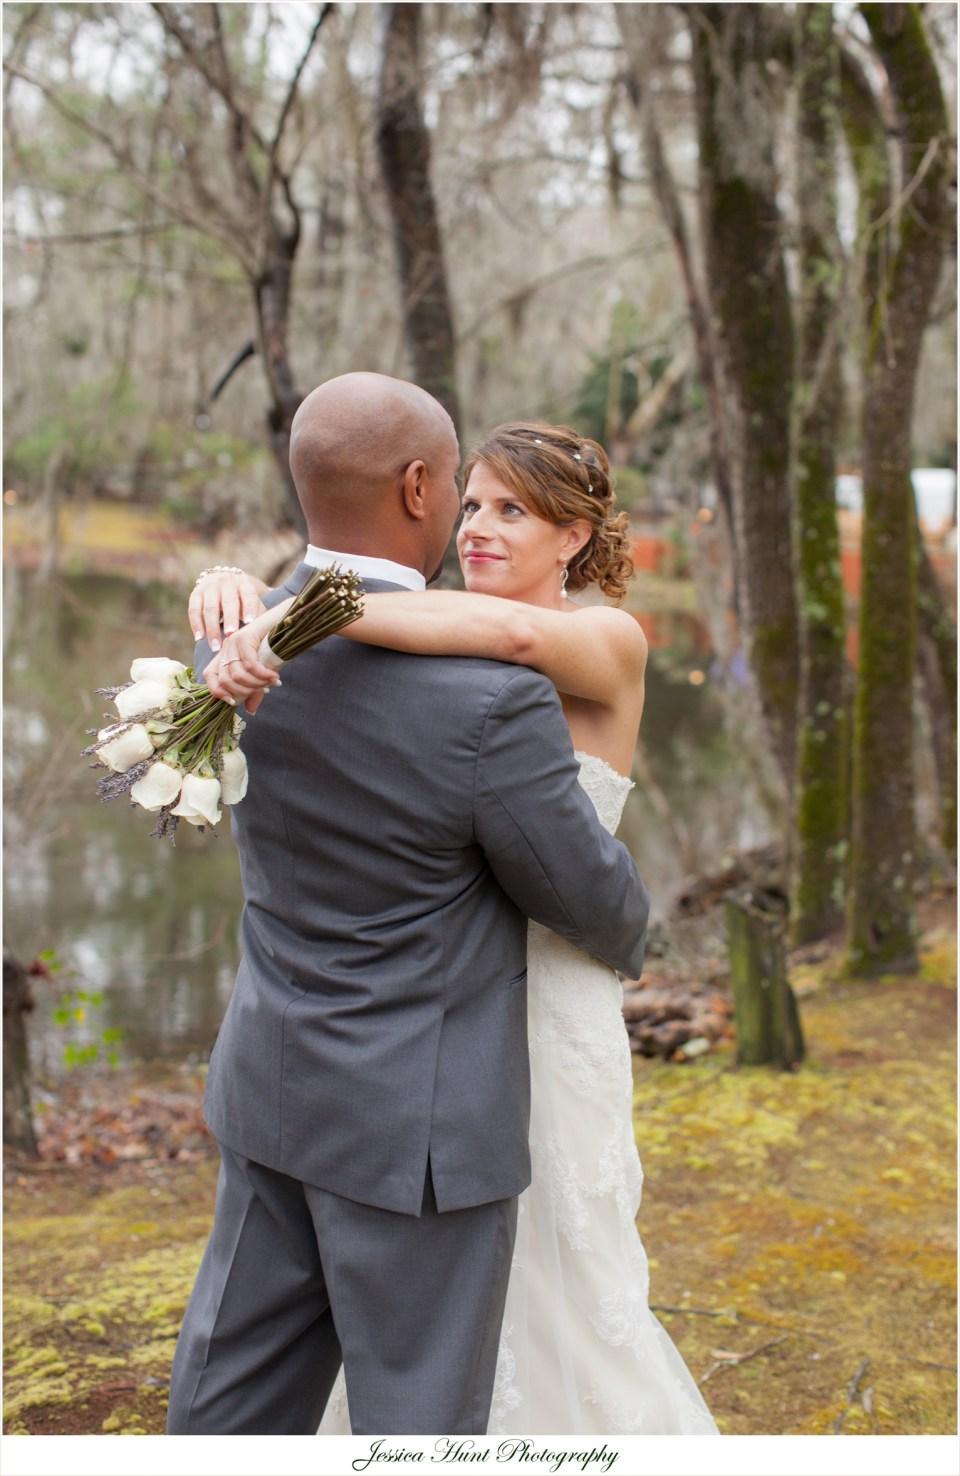 MillstoneatAdamsPond|JessicaHuntPhotography|SCWeddingPhotography|WeddingDay|2105|BLOG-56